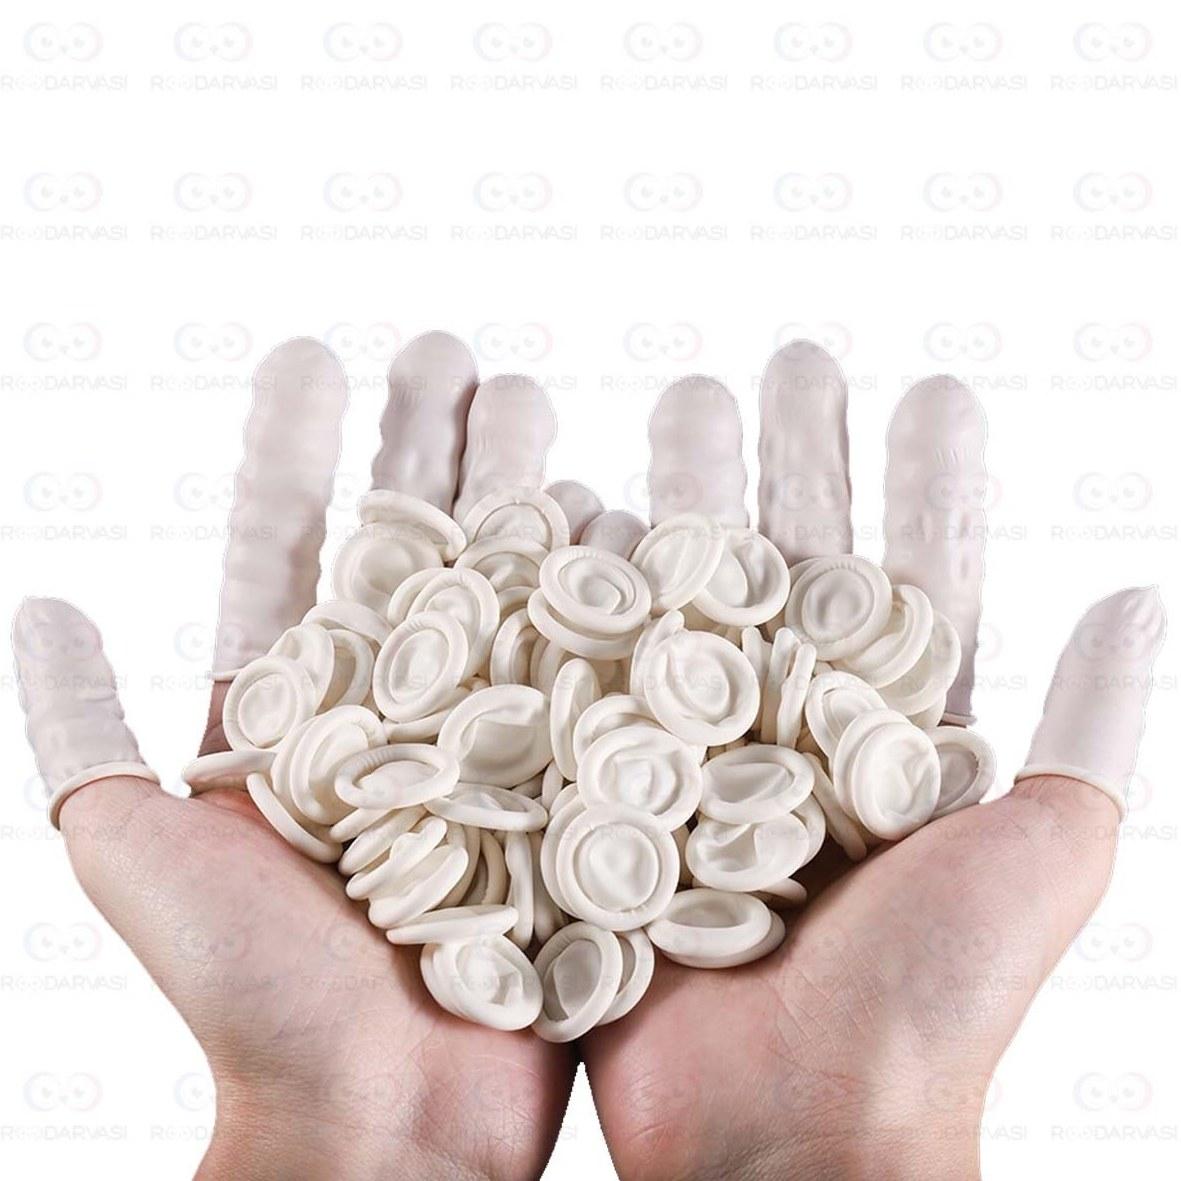 تصویر کاندوم انگشتی Finger Condom